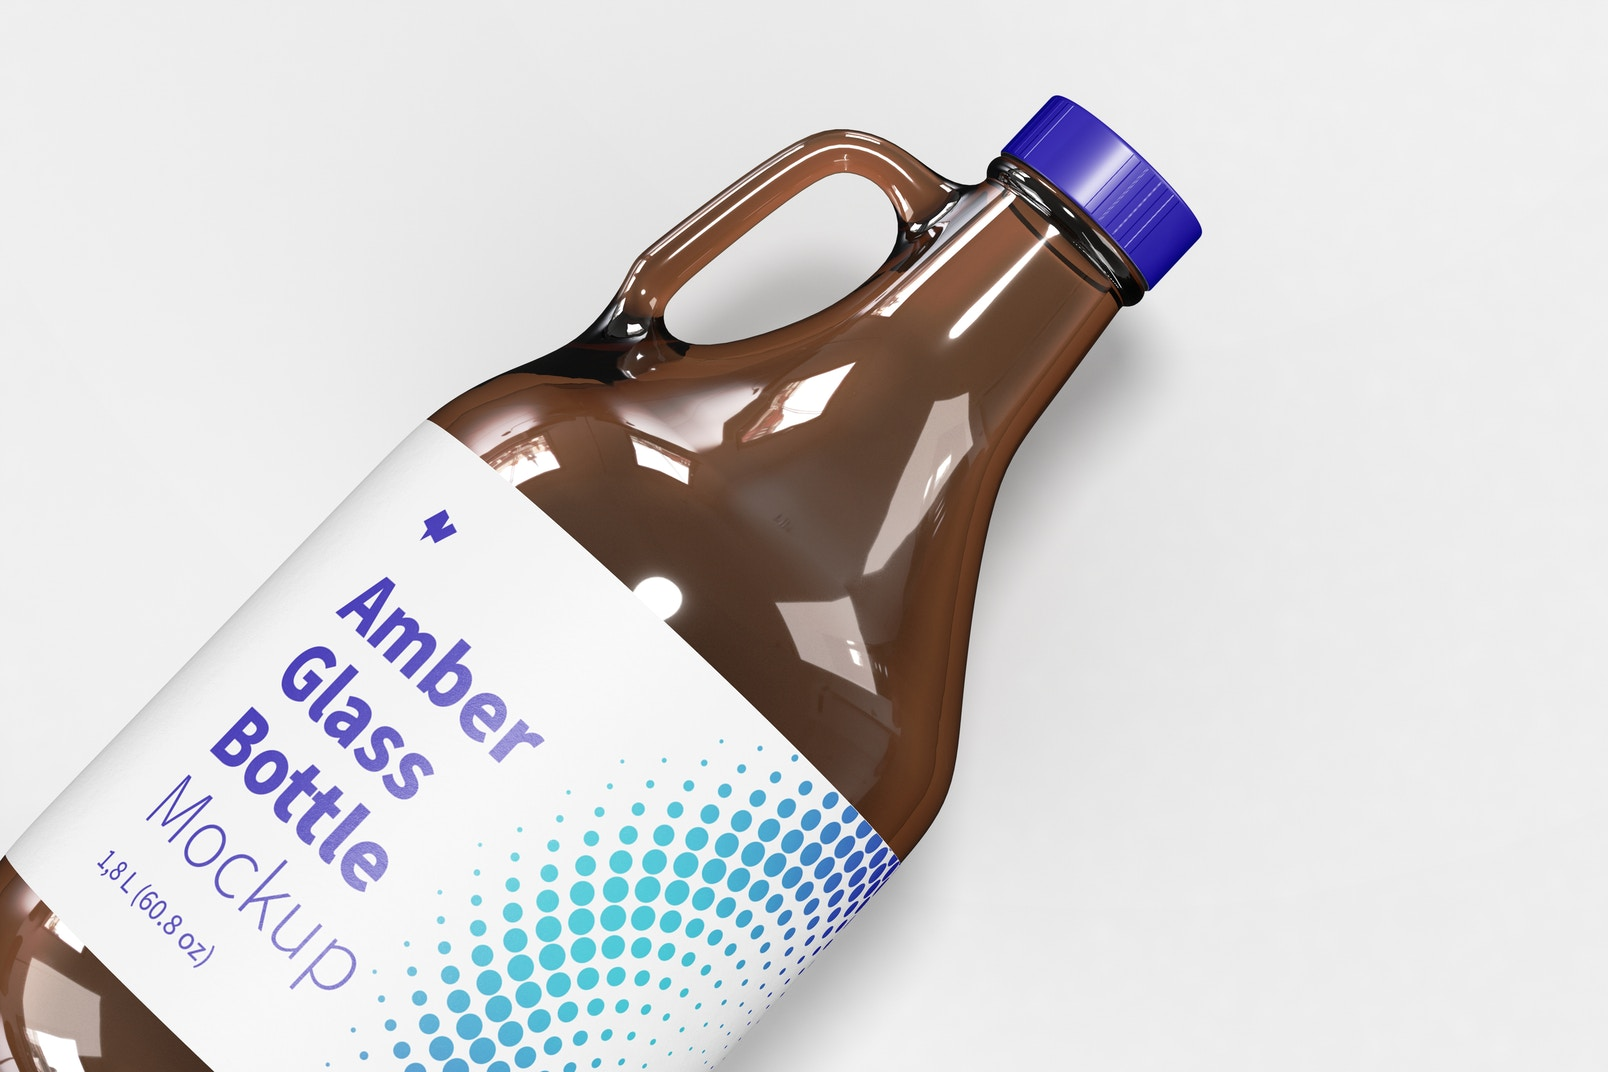 Amber Glass Bottle with Handle Jar Mockup, Close-Up